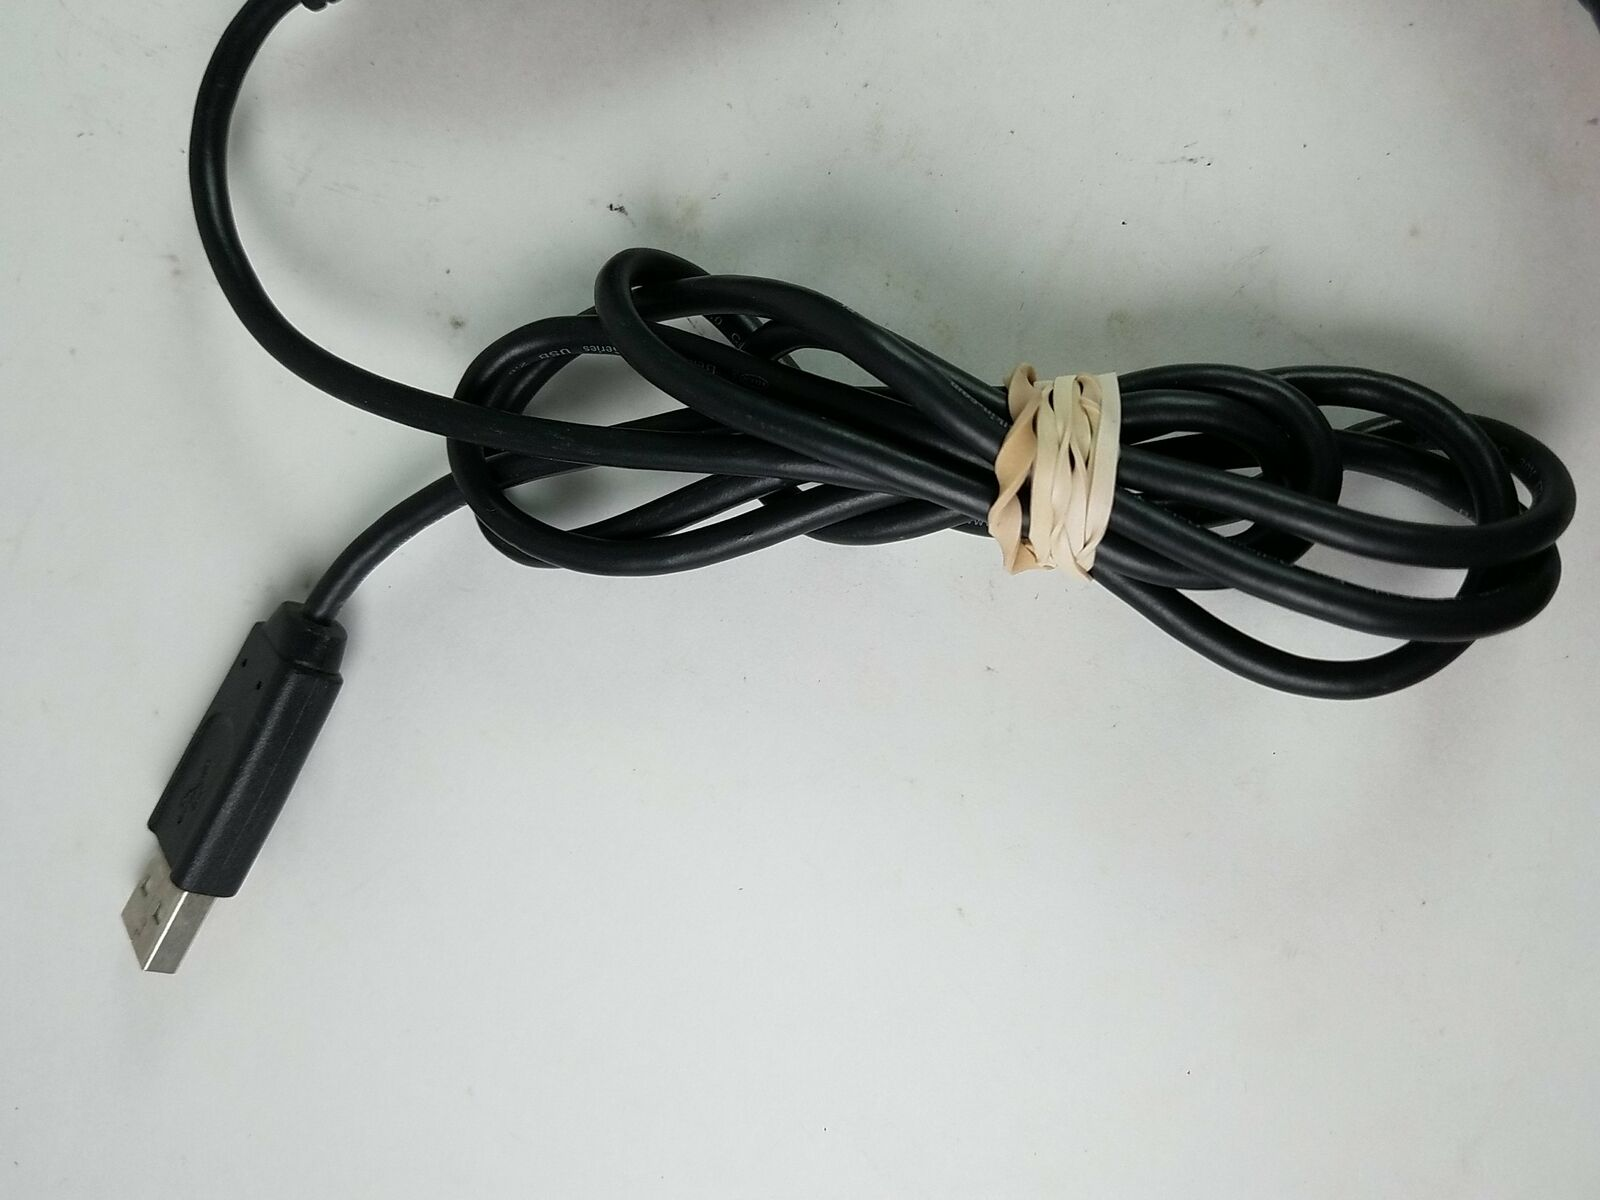 USB A macho a hembra Cable Cable extenstion con interruptor de encendido//apagado 11 in approx. 27.94 cm